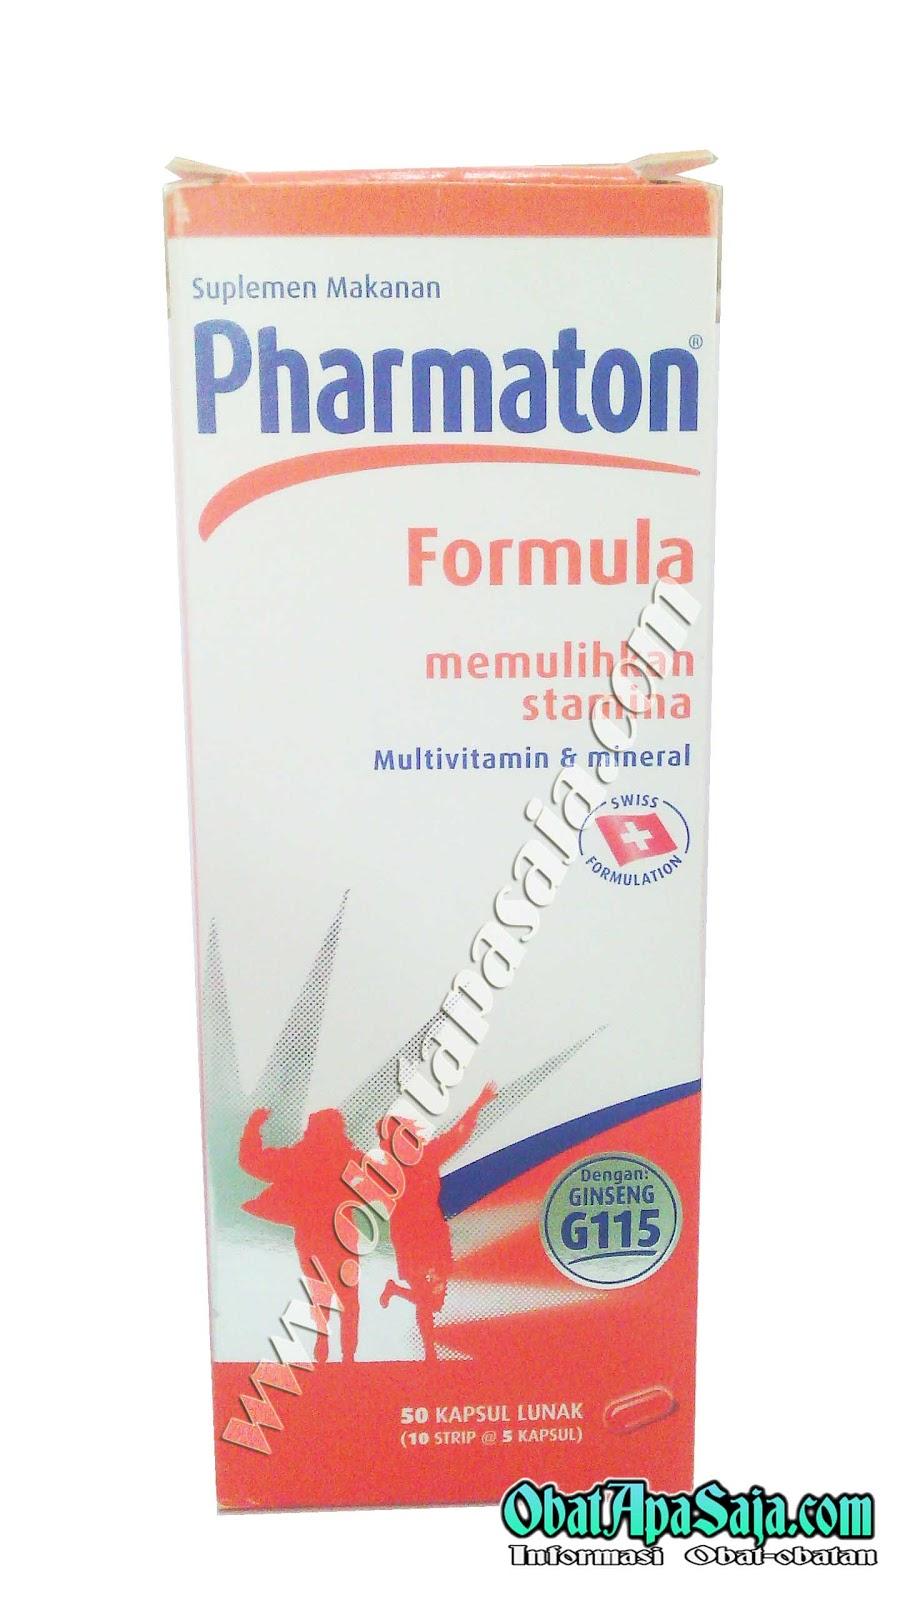 Pharmaton formula